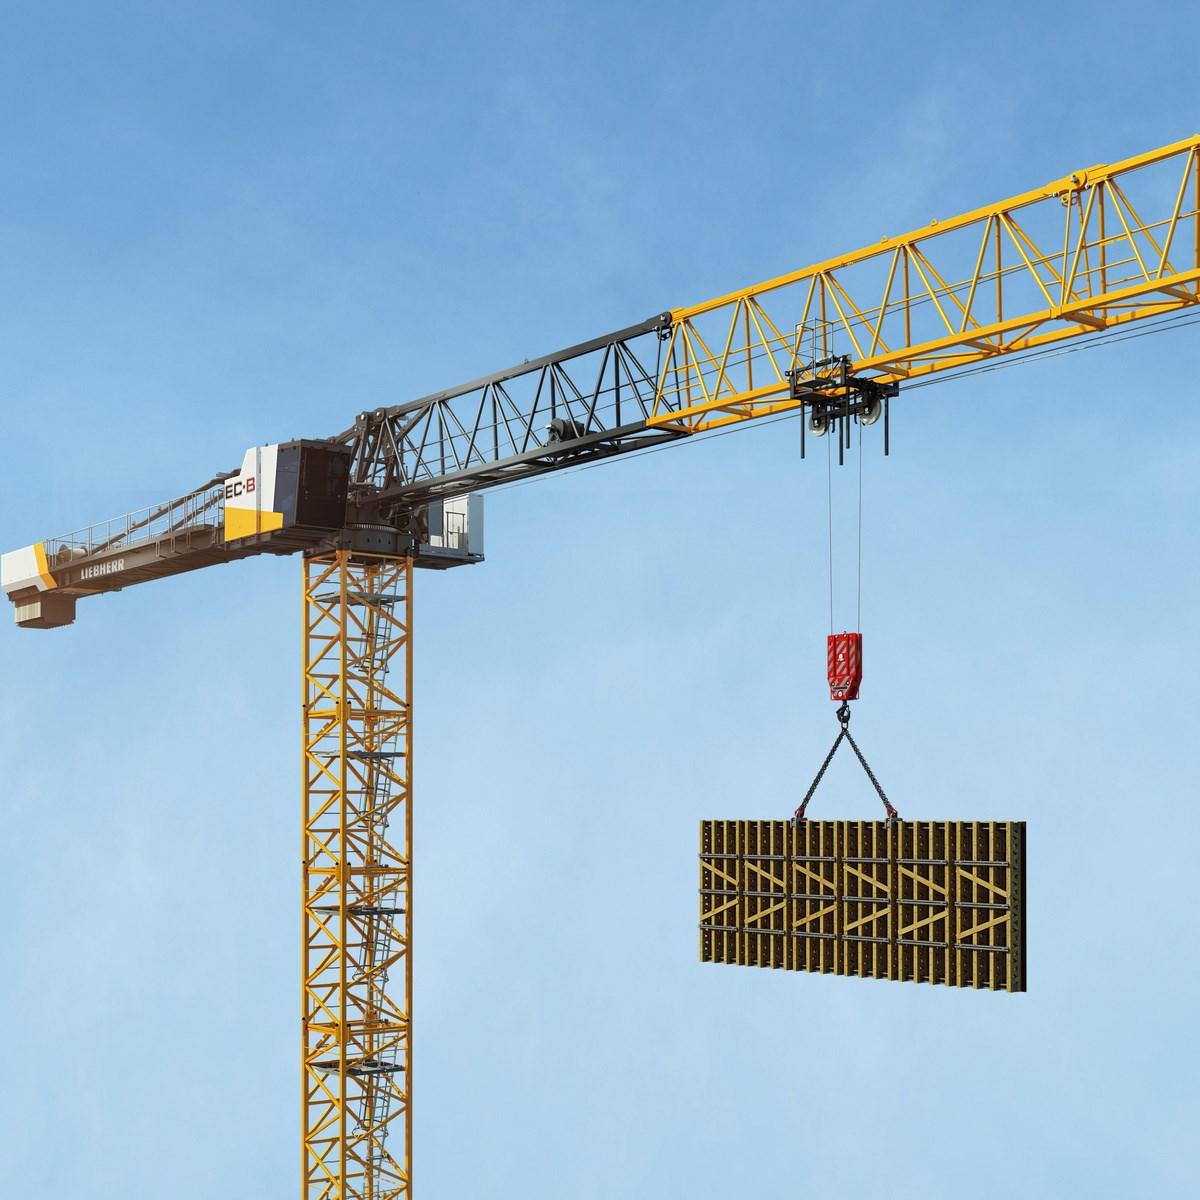 liebherr-new-ec-b-flat-top-crane-7.jpg